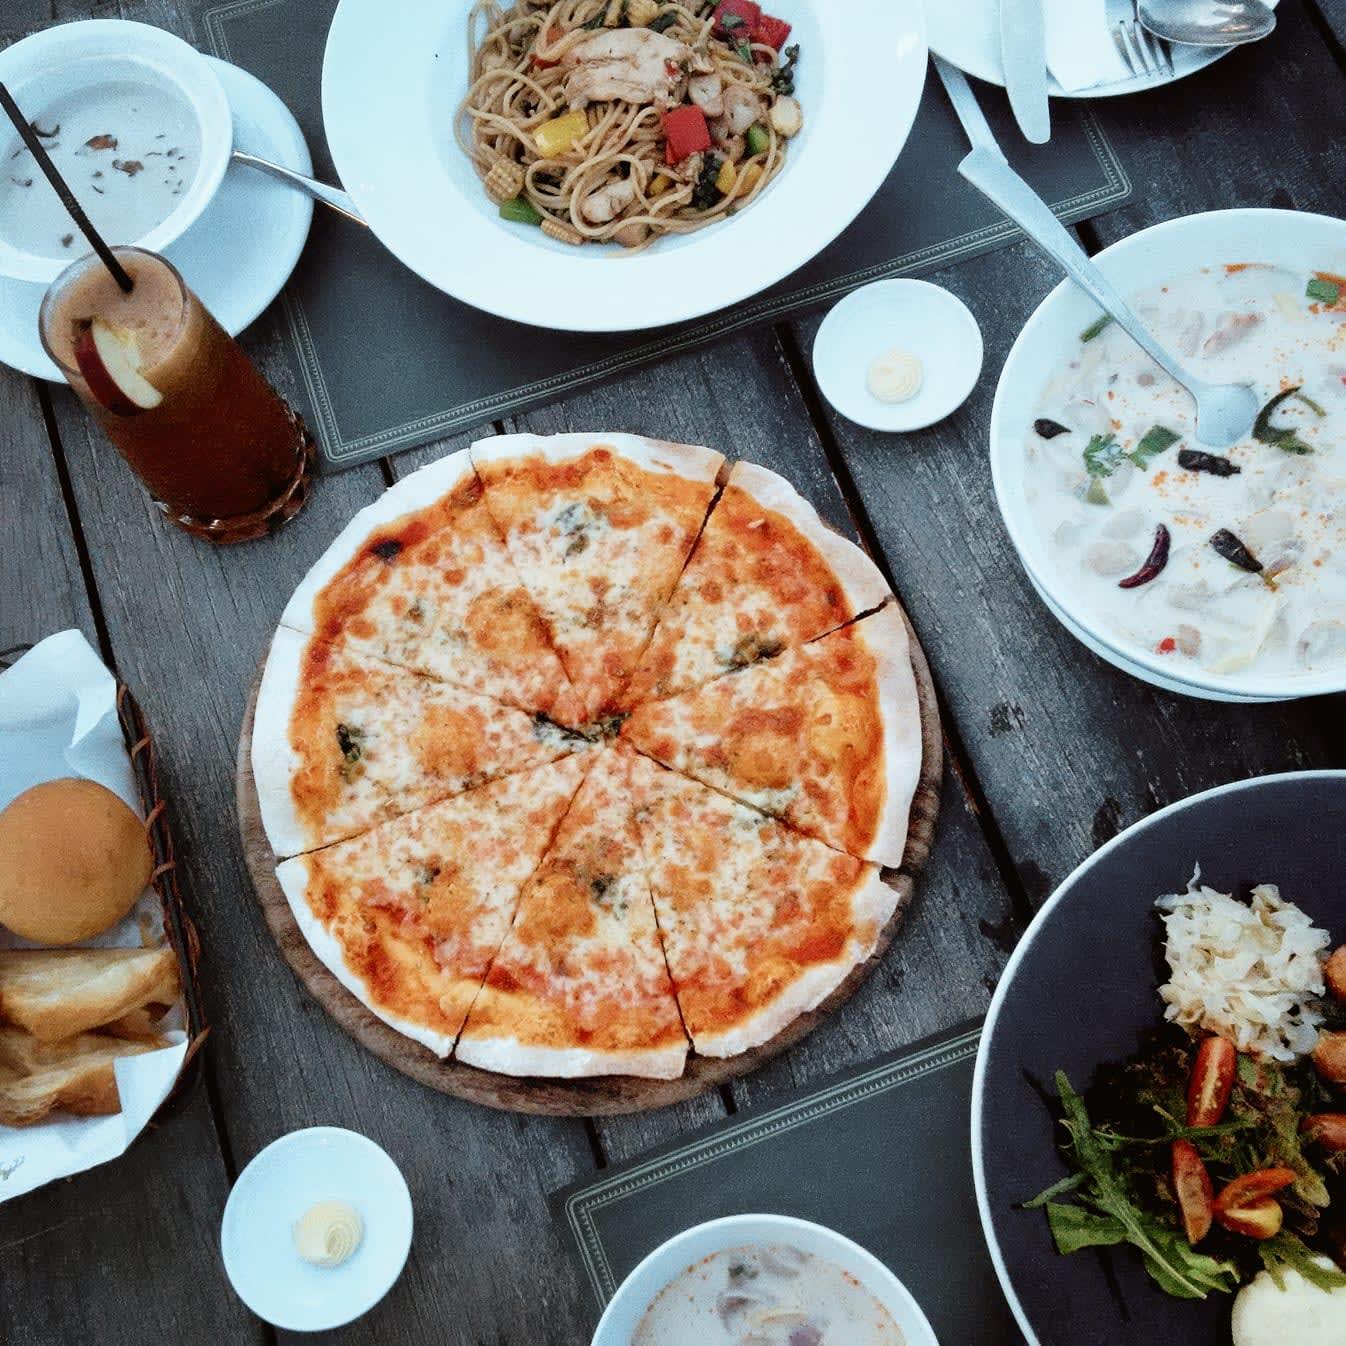 du lịch khao yai - ăn pizza tại midwinter green